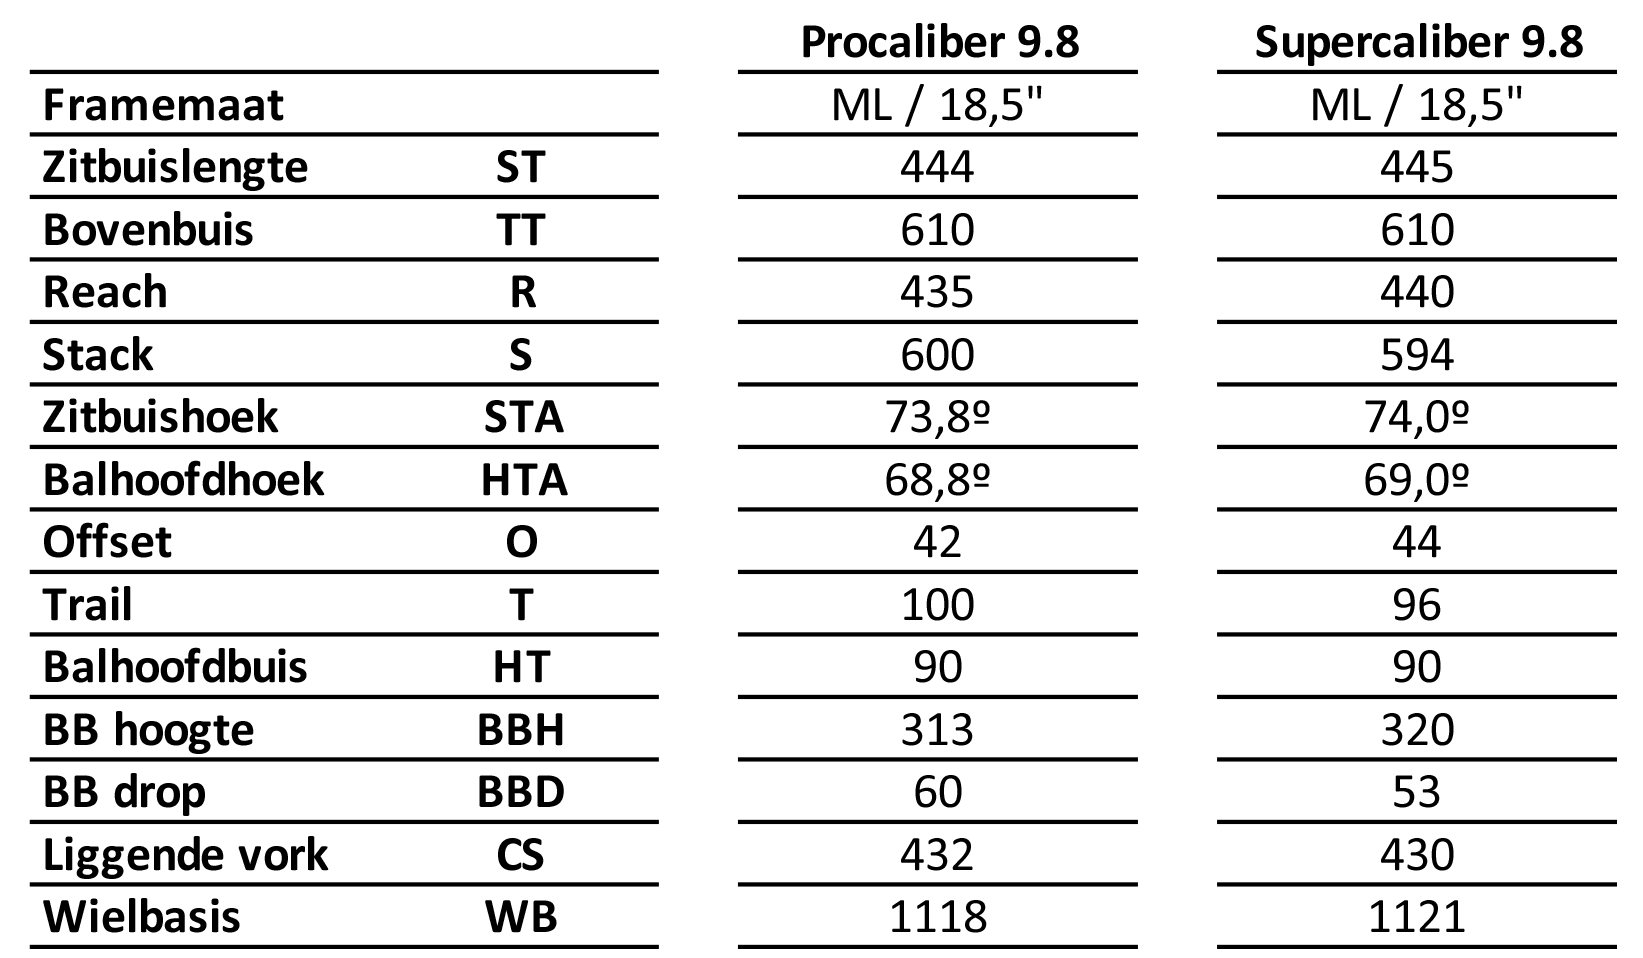 Trek Procaliber Supercaliber geometrie